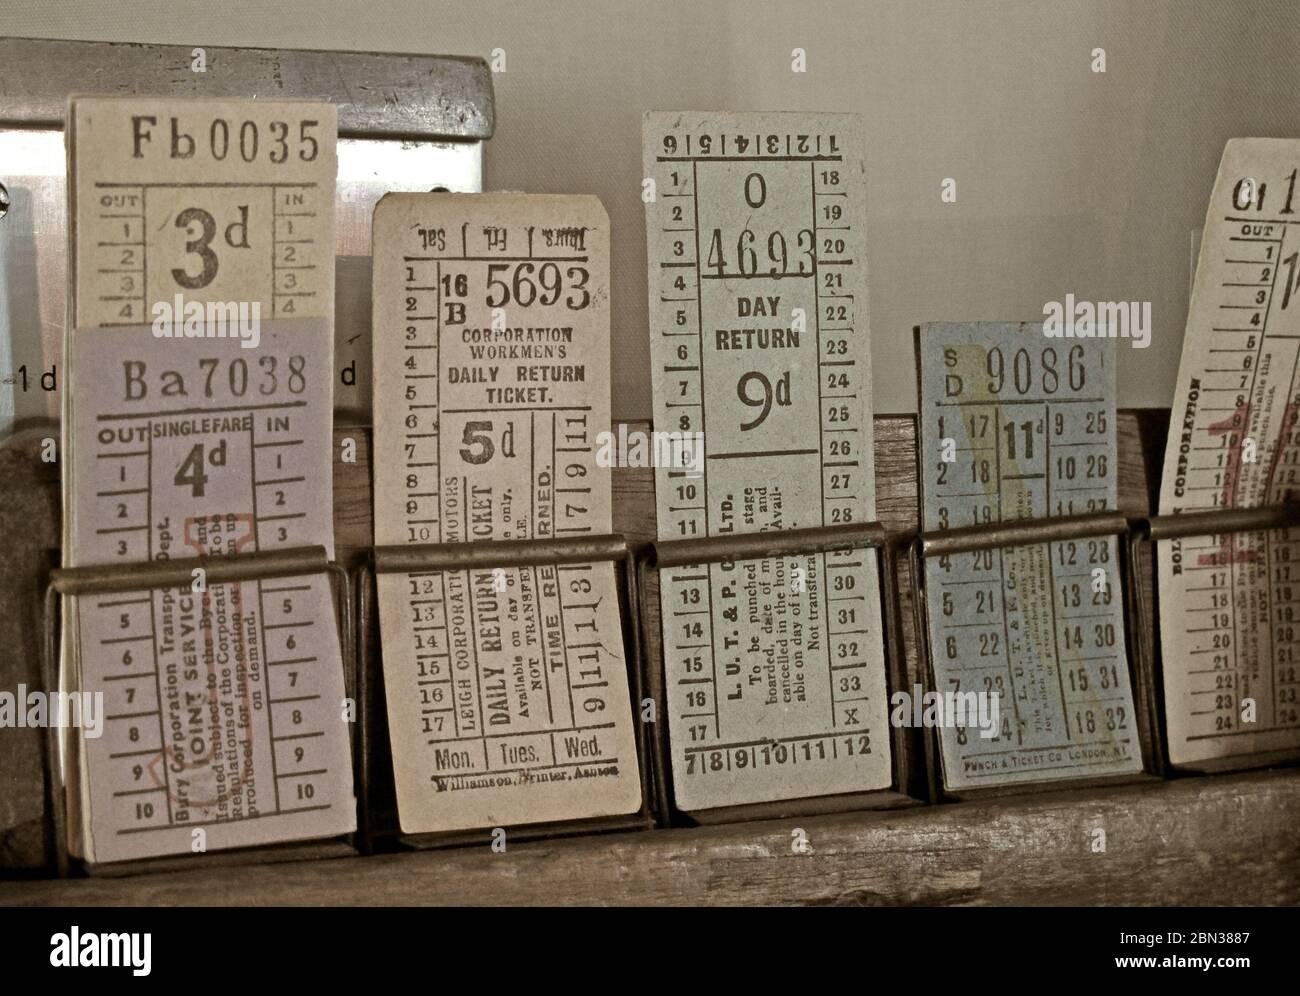 GoTonySmith,Hotpixuk,@Hotpixuk,3d,9d,5d,11d,single Bury bus tickets,from 1960s,Lancashire,England,UK,bus tickets,Bury,Manchester,3pence,9pence,5pence,buses,ticket,fare,price,Preprinted bus Tickets,Preprinted tickets,Preprinted,Bury Corporation Transport,Bury Corporation,Transport,card,paper